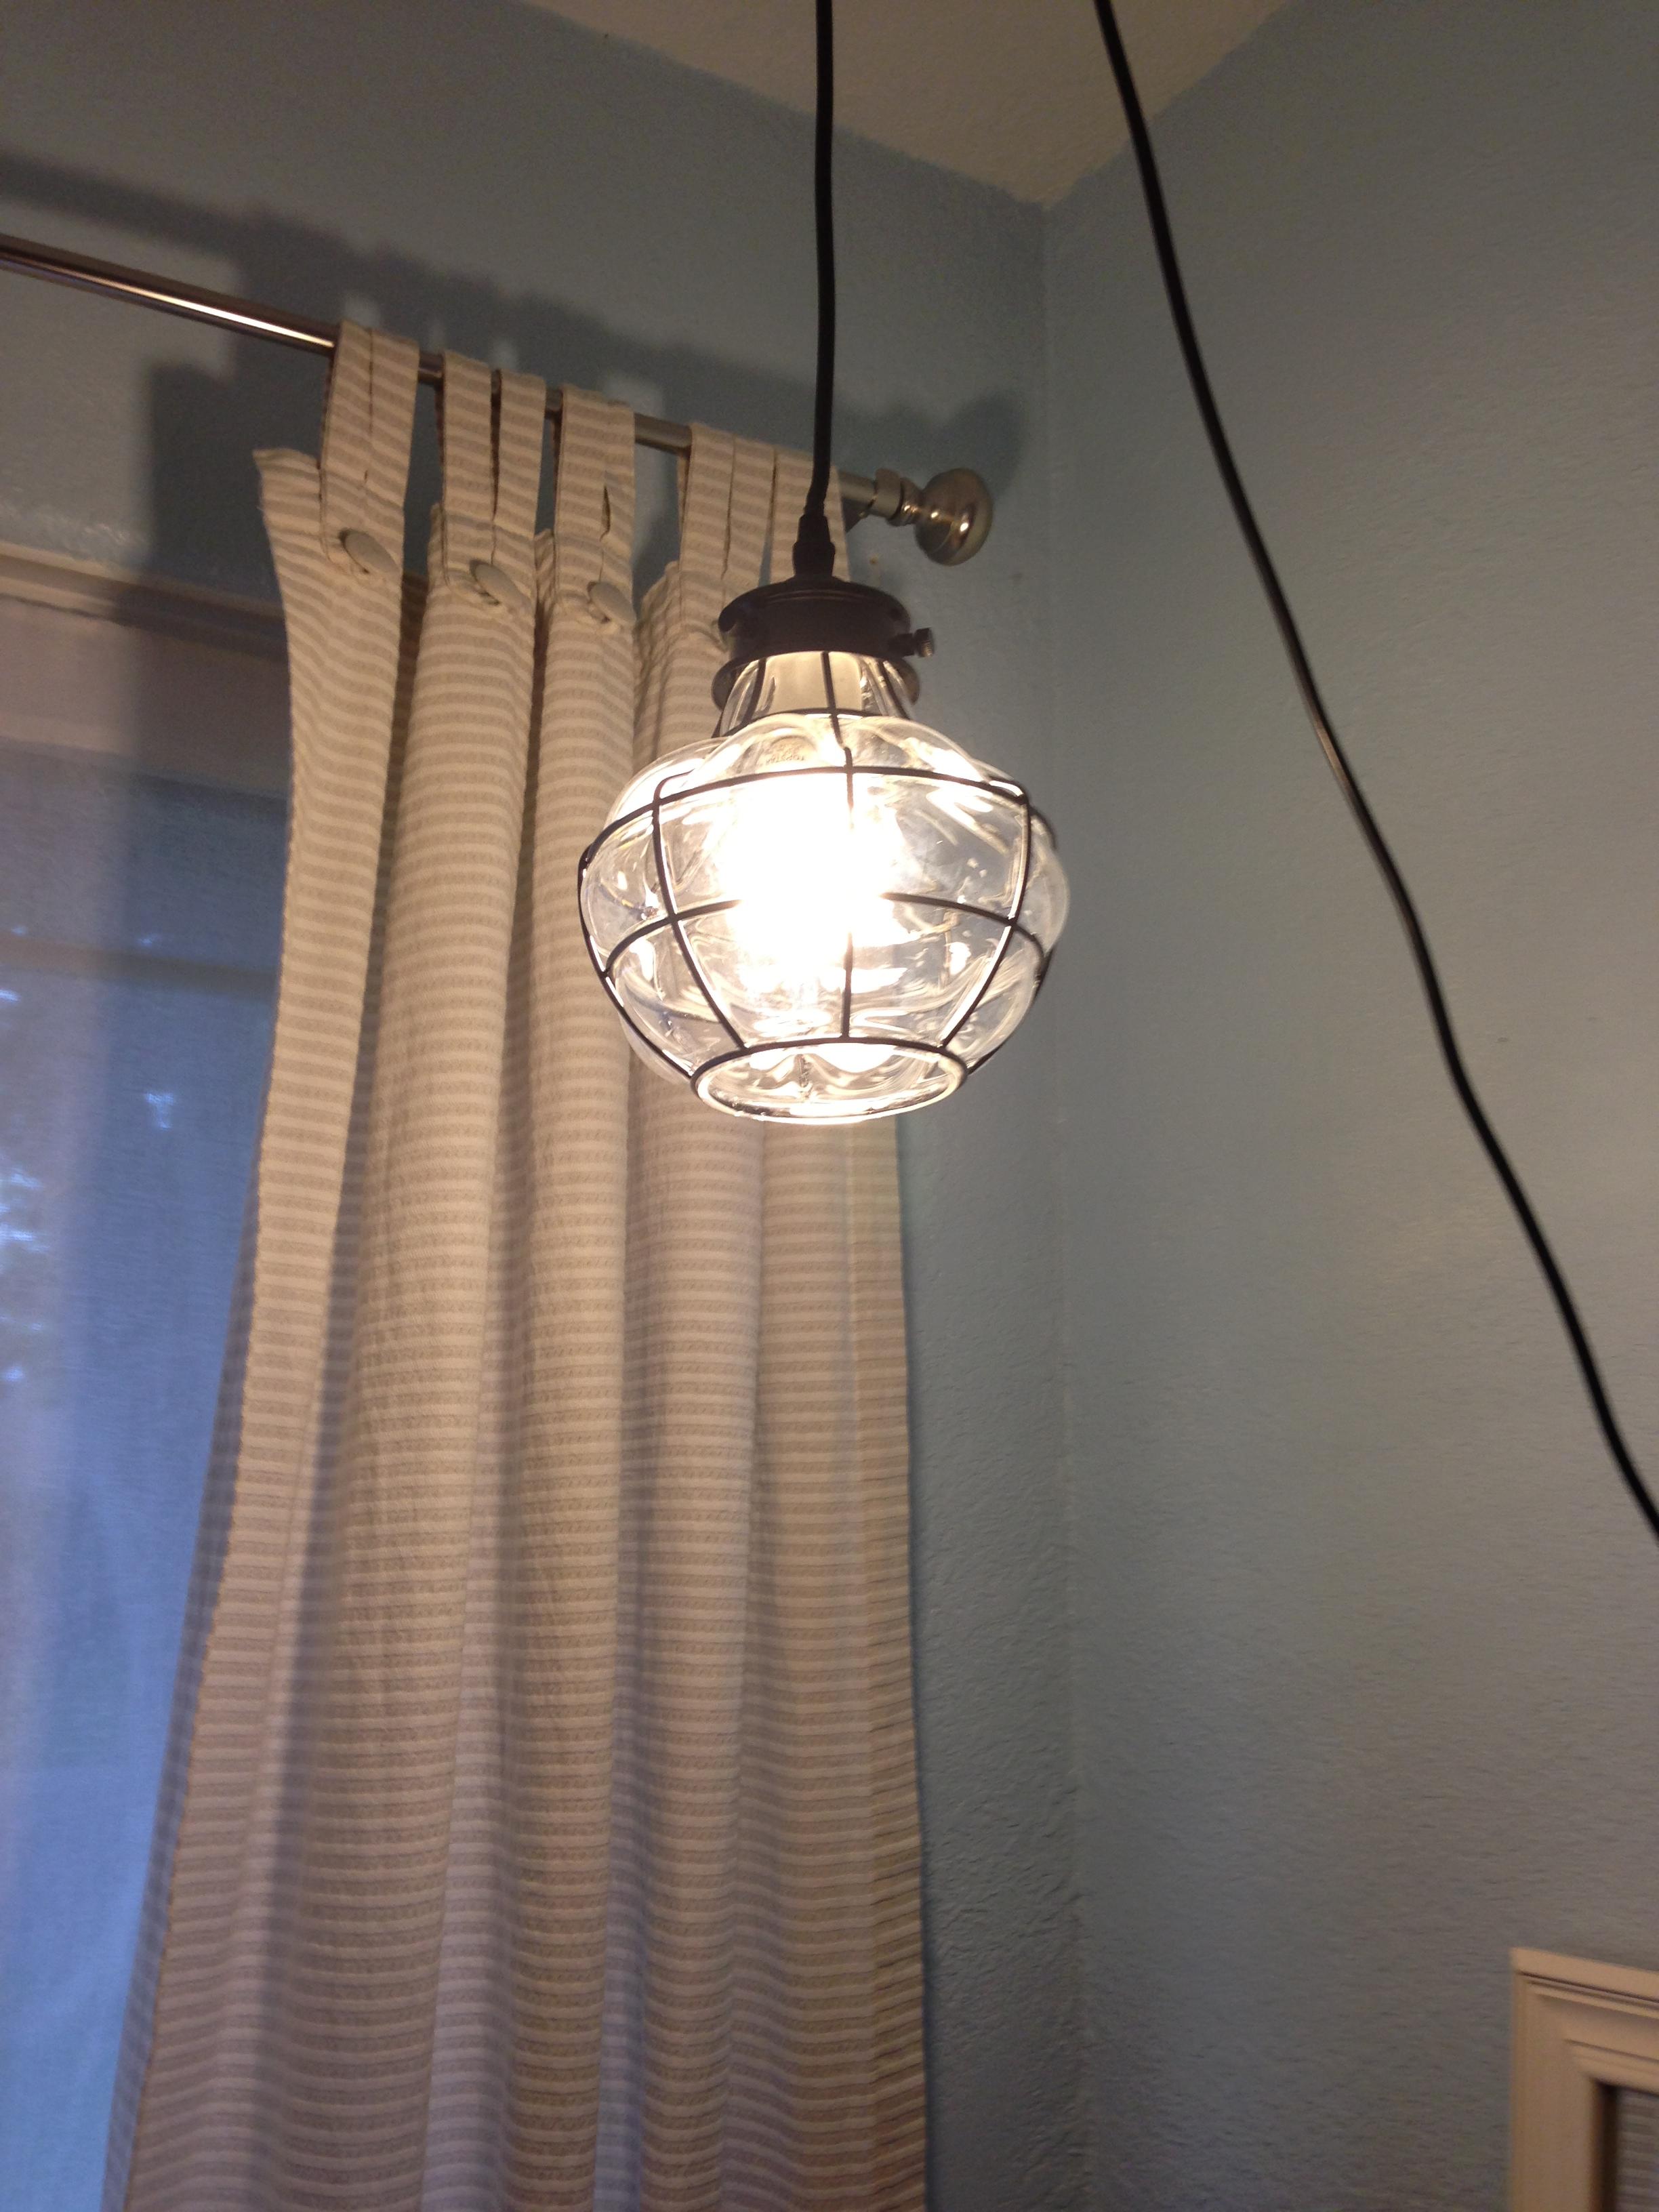 A Few Inexpensive Updates…Drum light Ceiling Fan